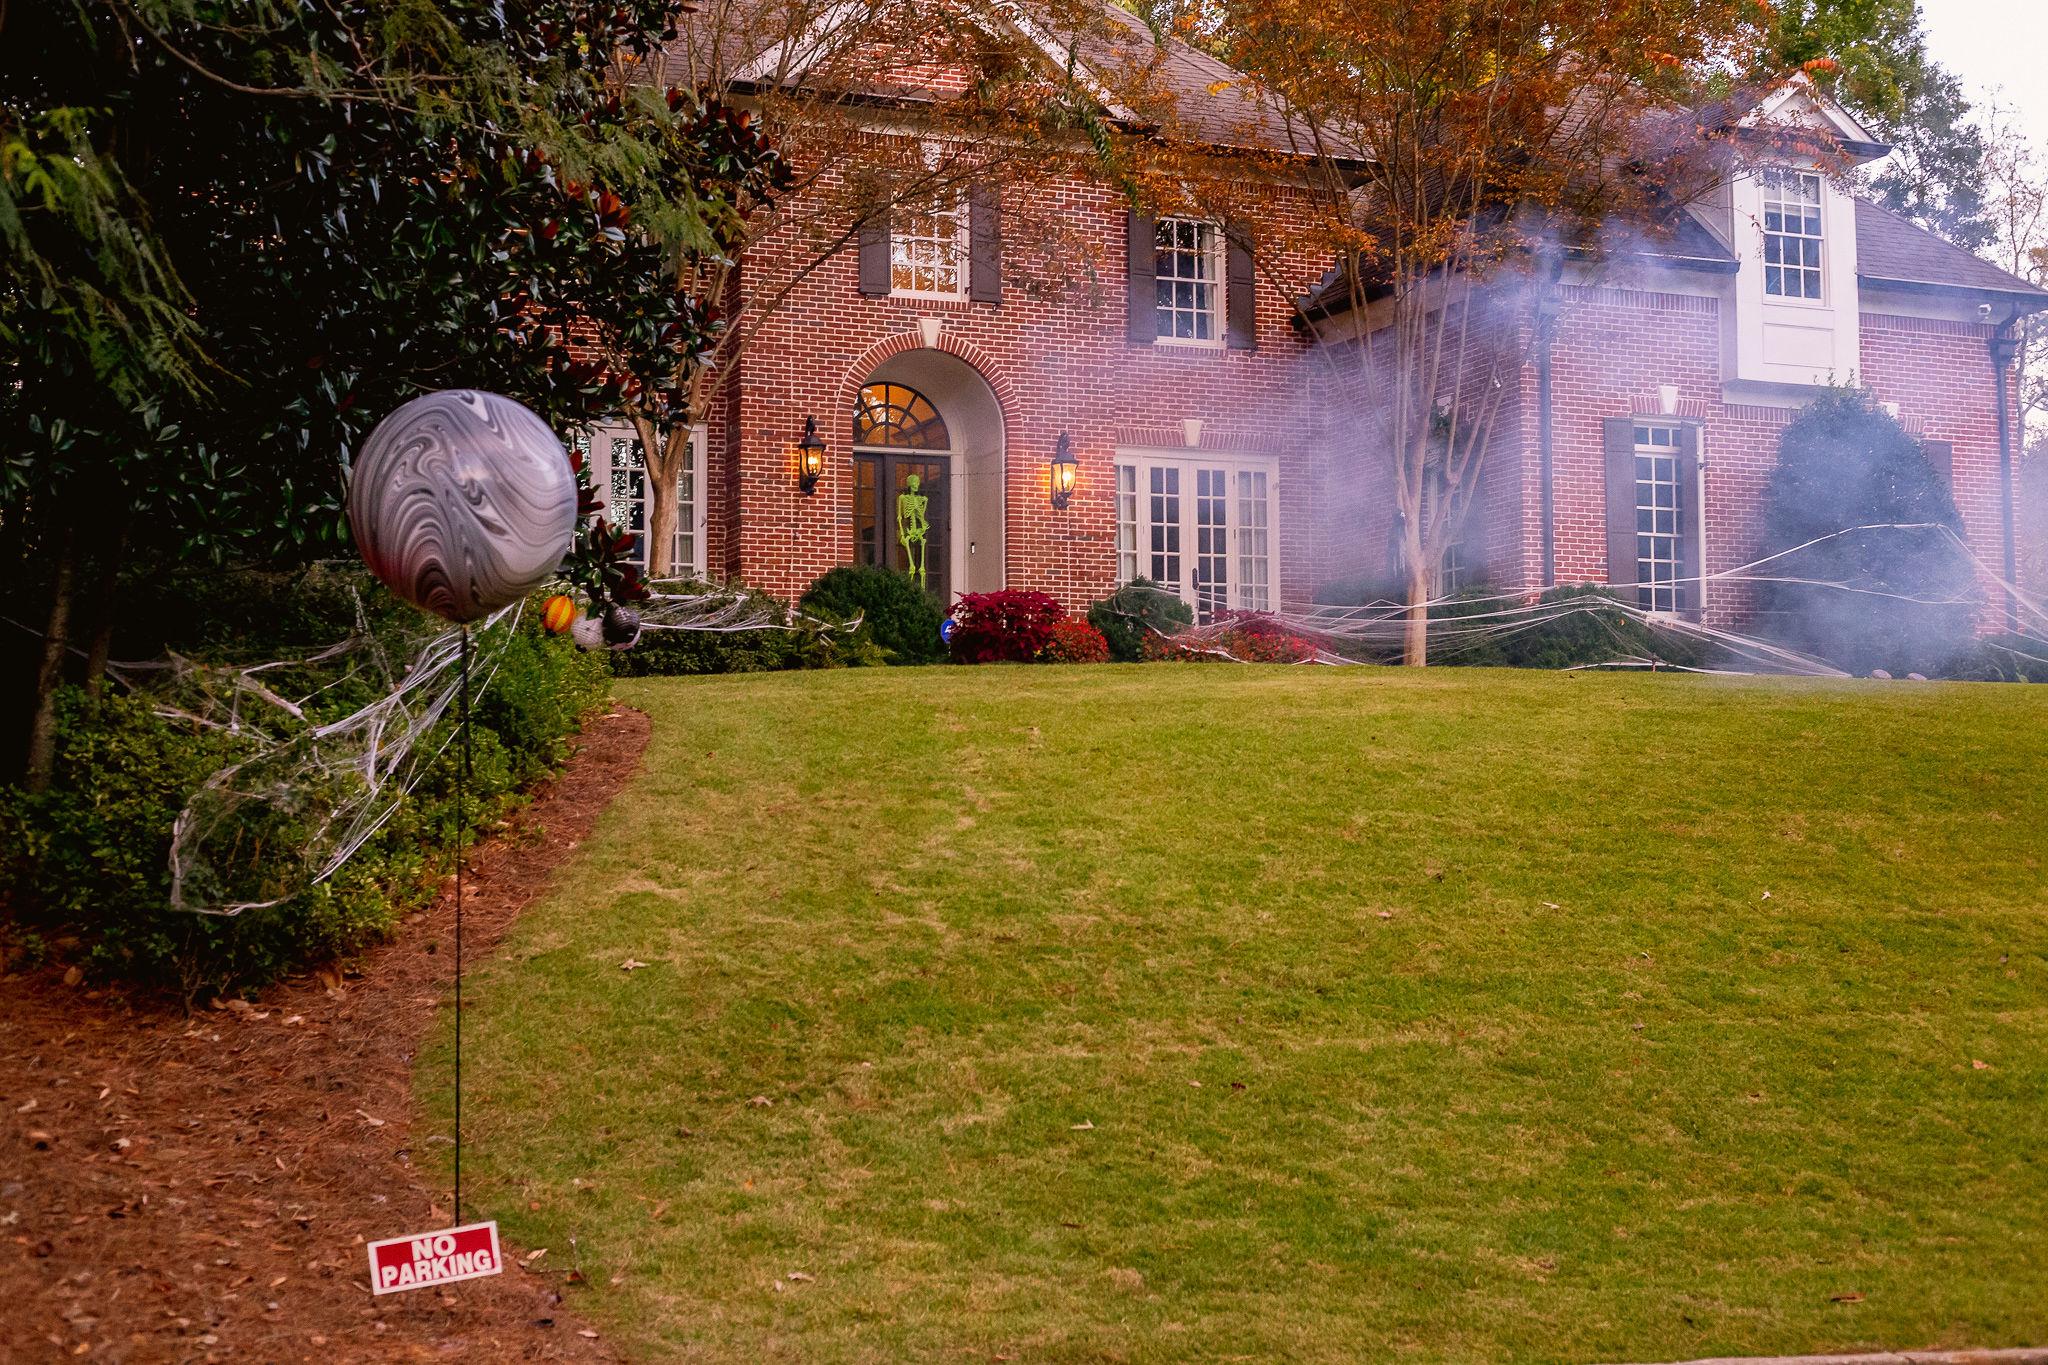 creepy Halloween party front yard decor with smoke machine